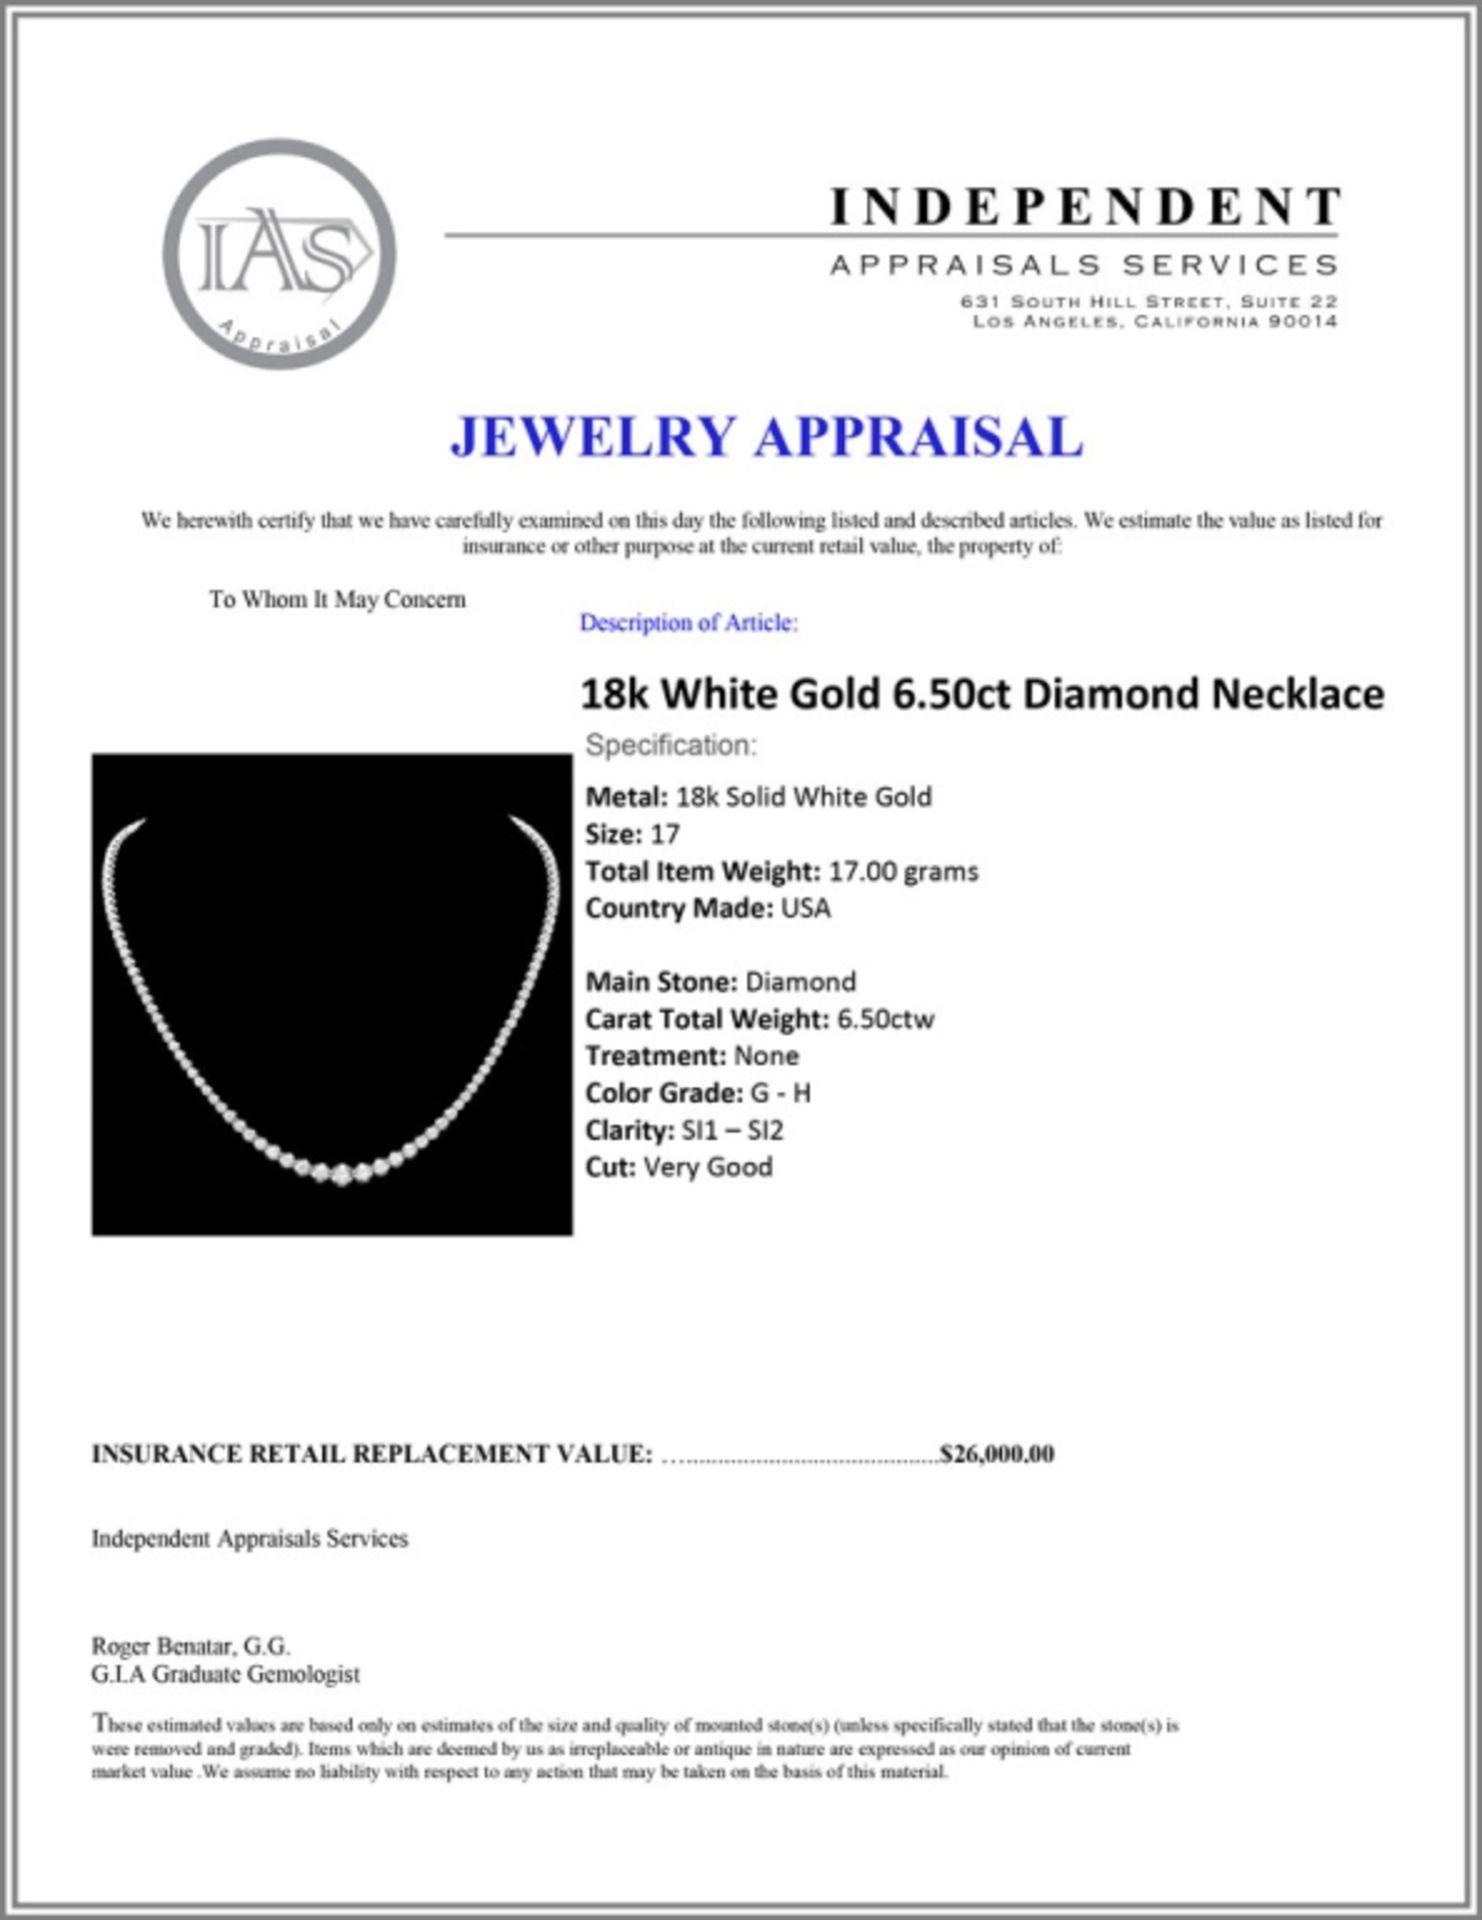 18k White Gold 6.50ct Diamond Necklace - Image 3 of 3